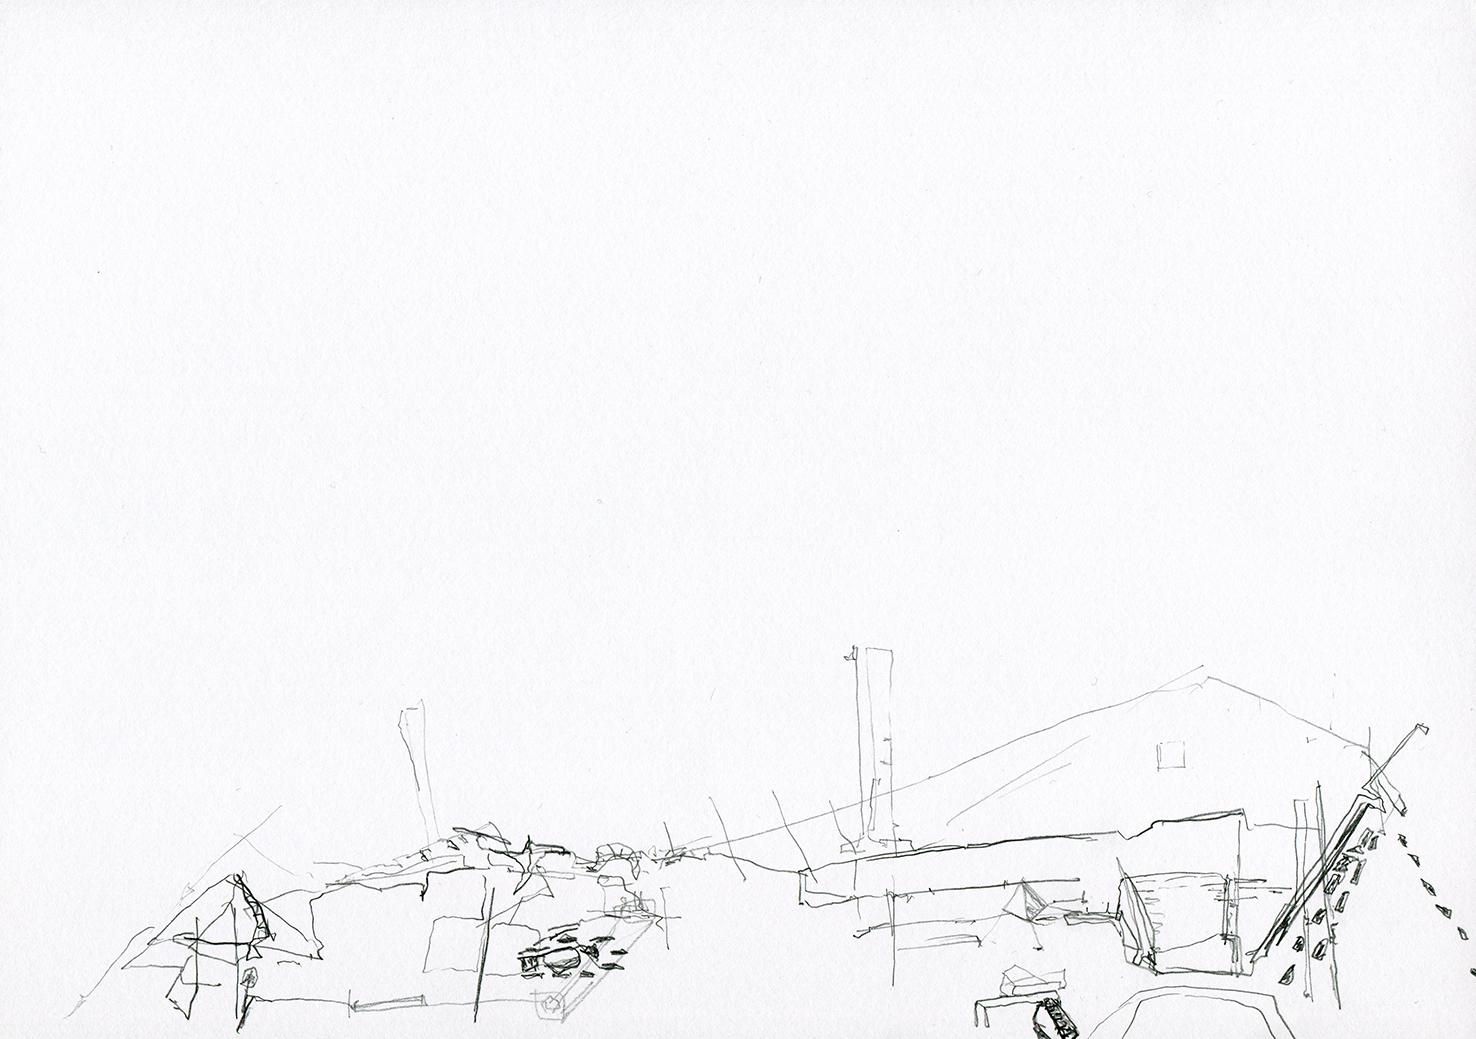 Ungenutzte flächen (Useless planes), 2011 |  | ProjecteSD